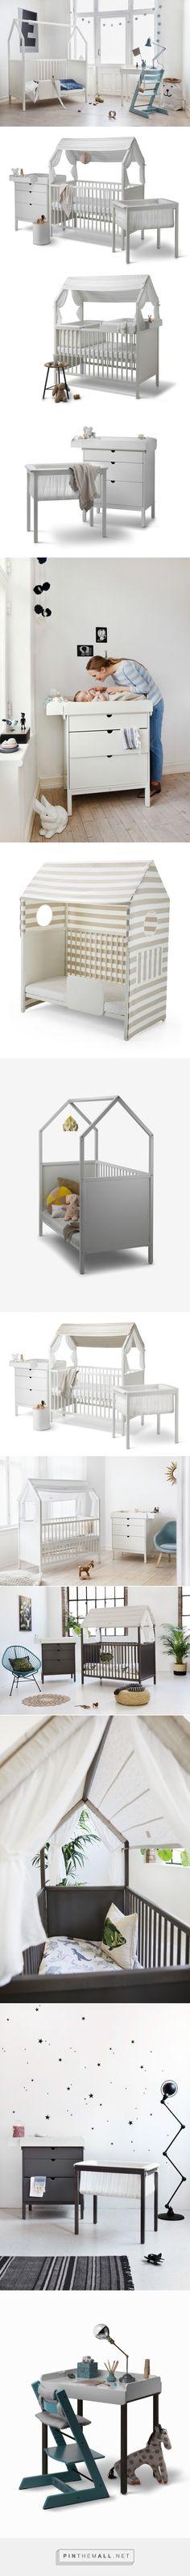 Stokke Home: A Modular, Multifunctional Nursery - Design Milk - created via http://pinthemall.net